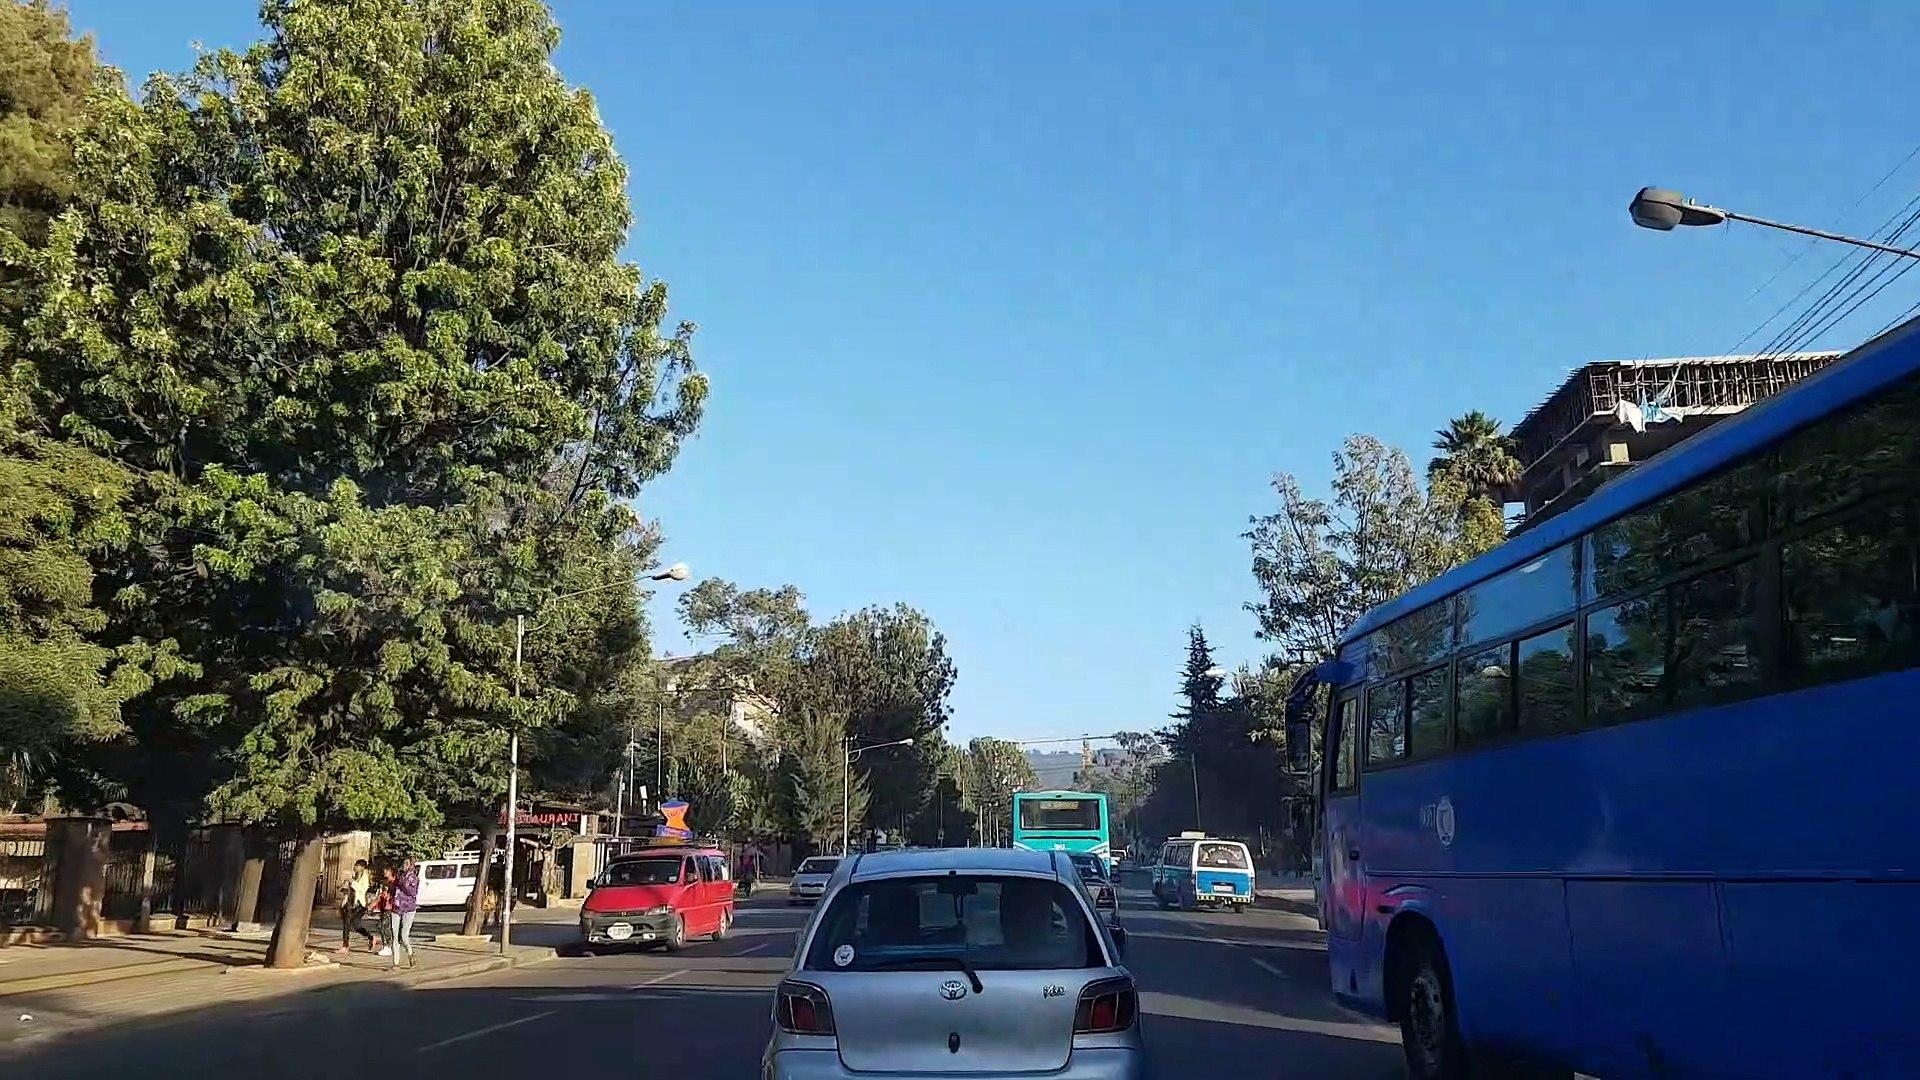 Fahrt durch Addis Ababa / Addis Abeba  - Ethiopia